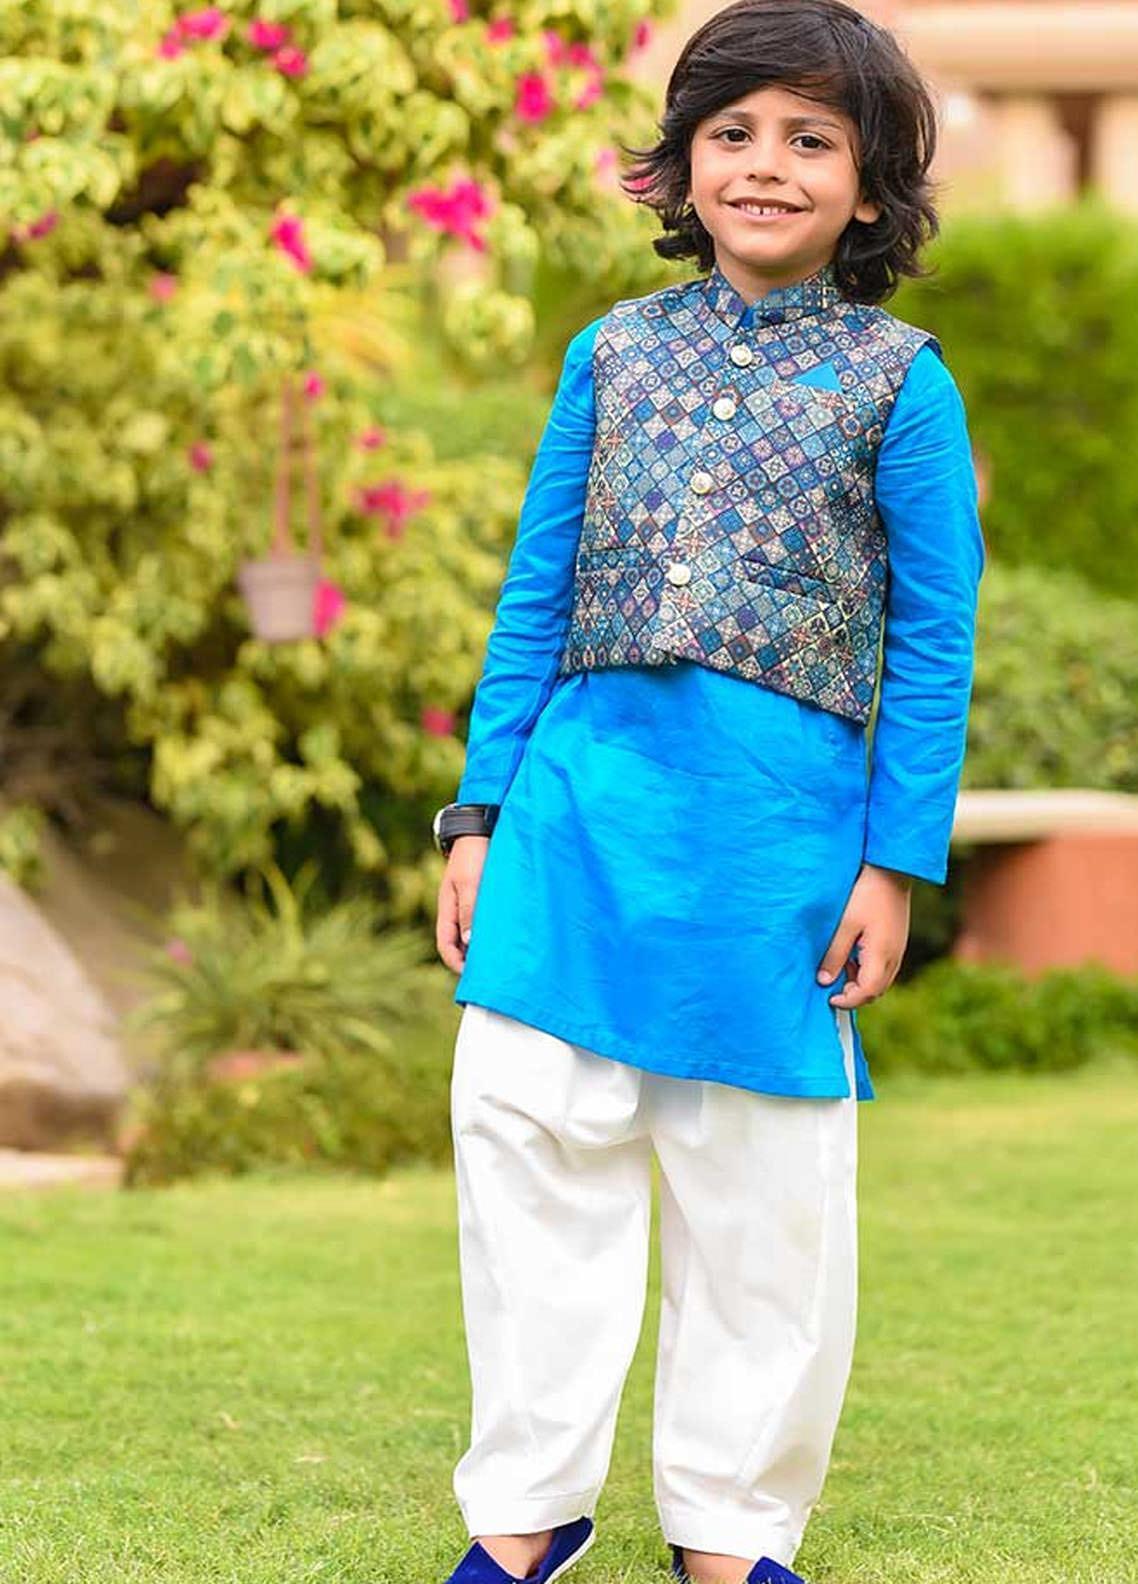 Ochre Cotton Formal Boys Kurta Shalwar with Waistcoat -  OBK-12 Blue